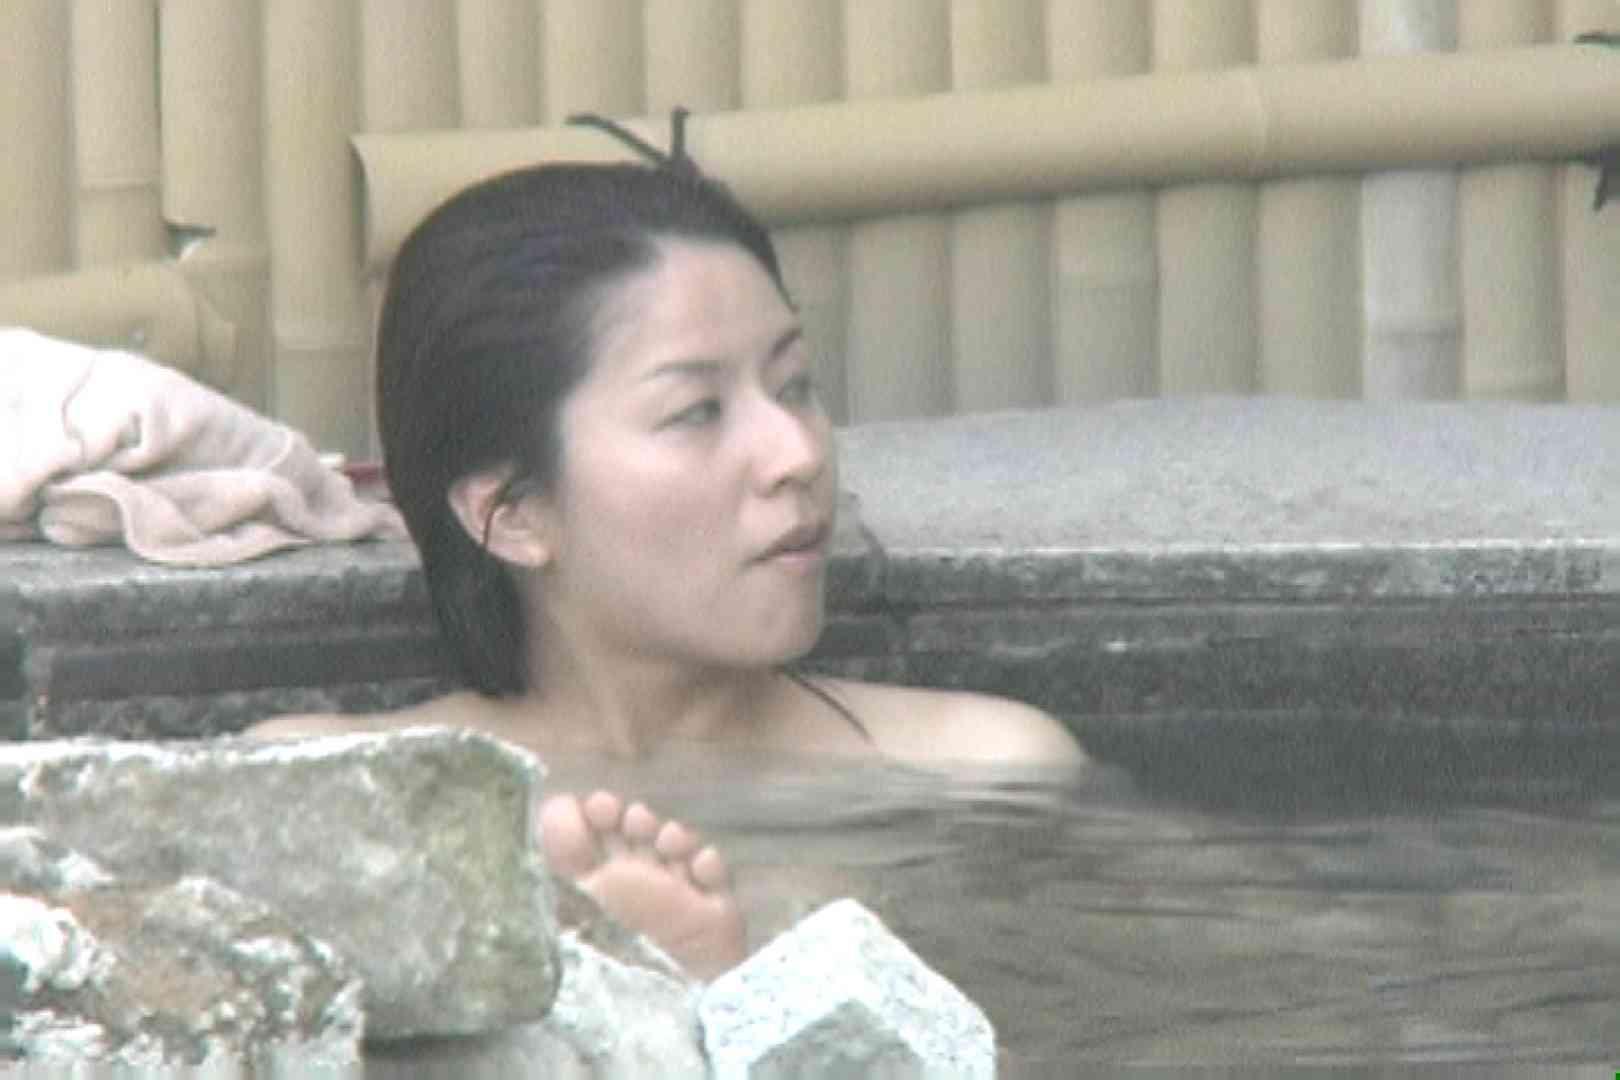 Aquaな露天風呂Vol.694 盗撮 AV無料 67画像 65